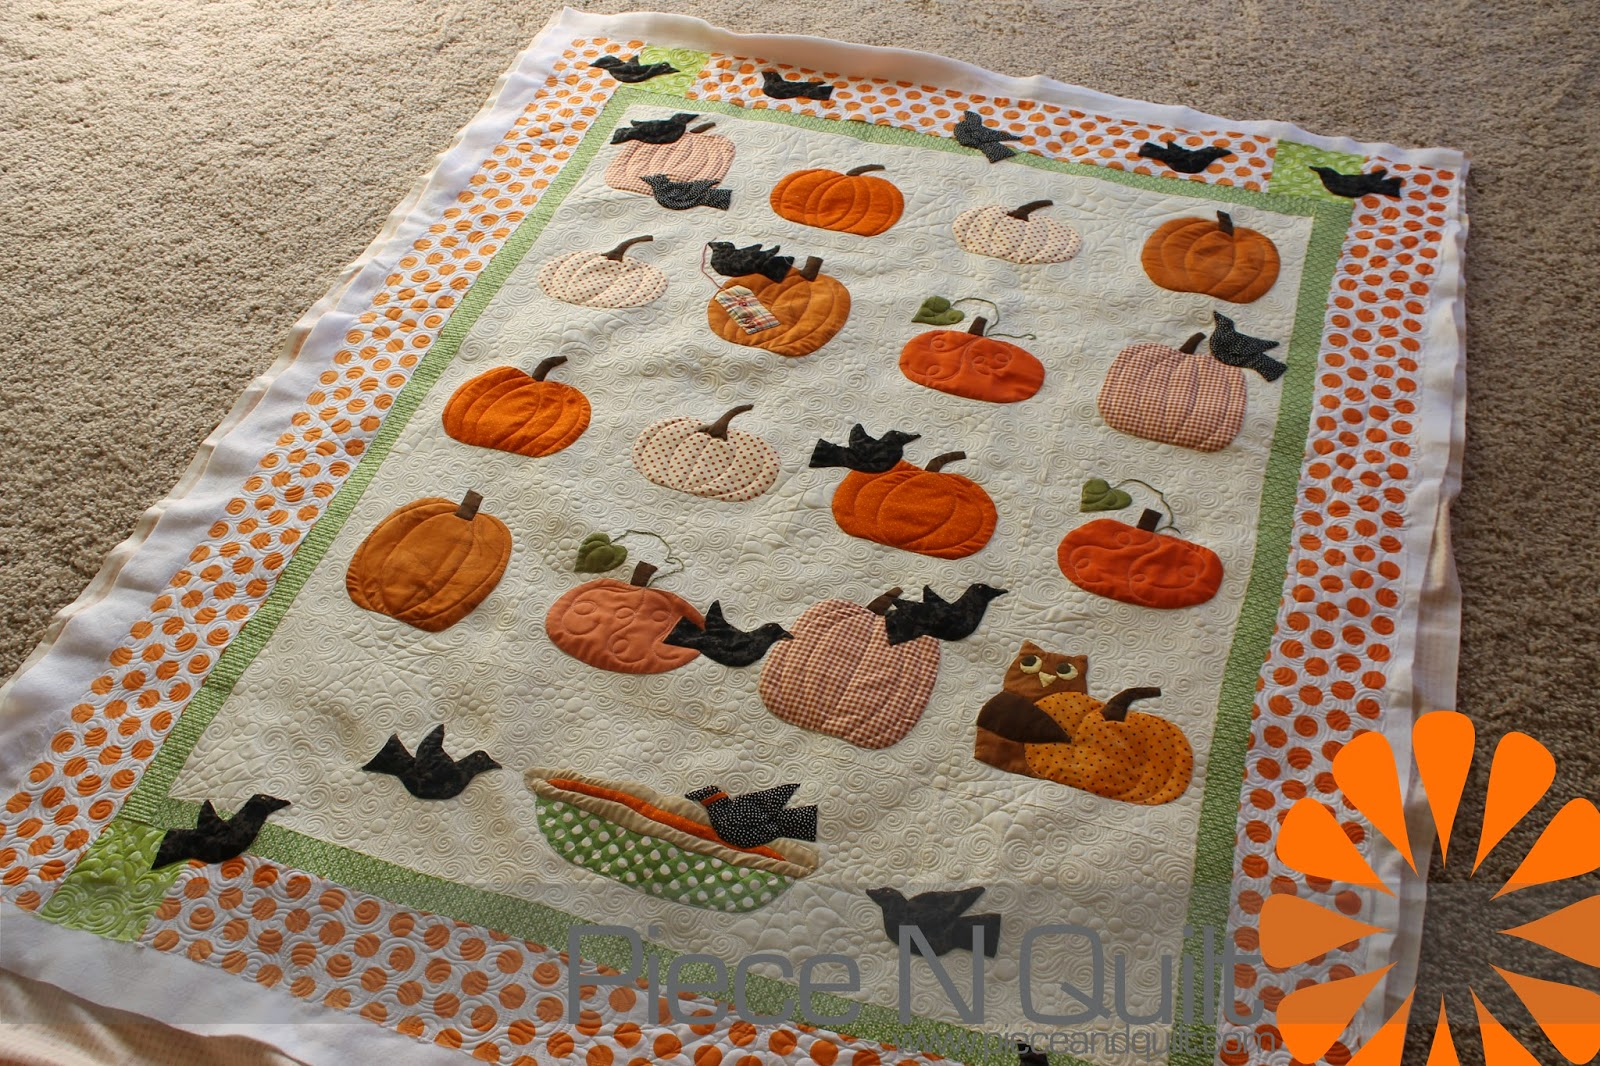 Piece N Quilt: Pumpkin Quilt : piece n quilt - Adamdwight.com